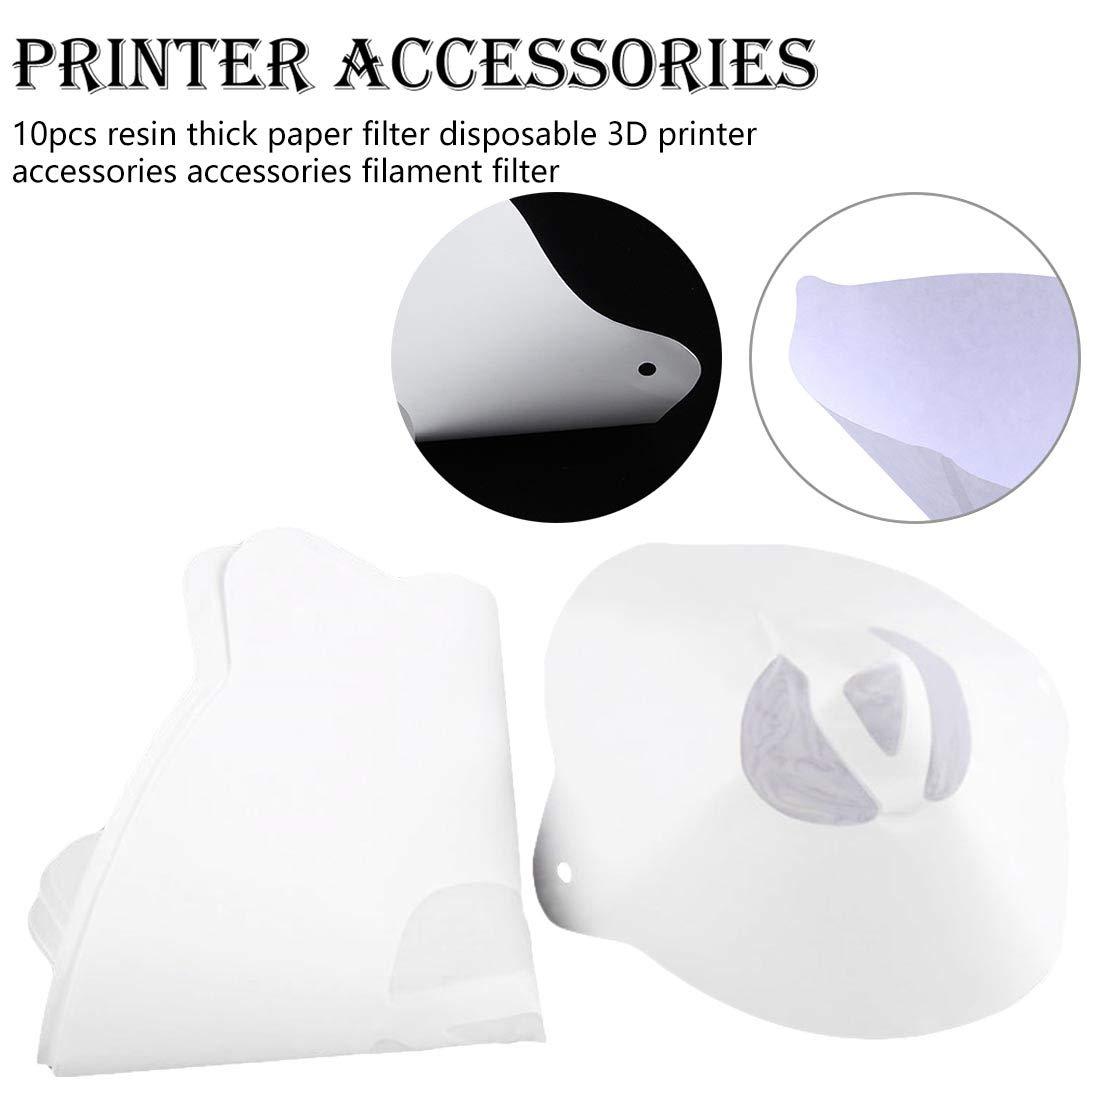 10 unids resina de filtro de papel grueso desechable 3D accesorios ...